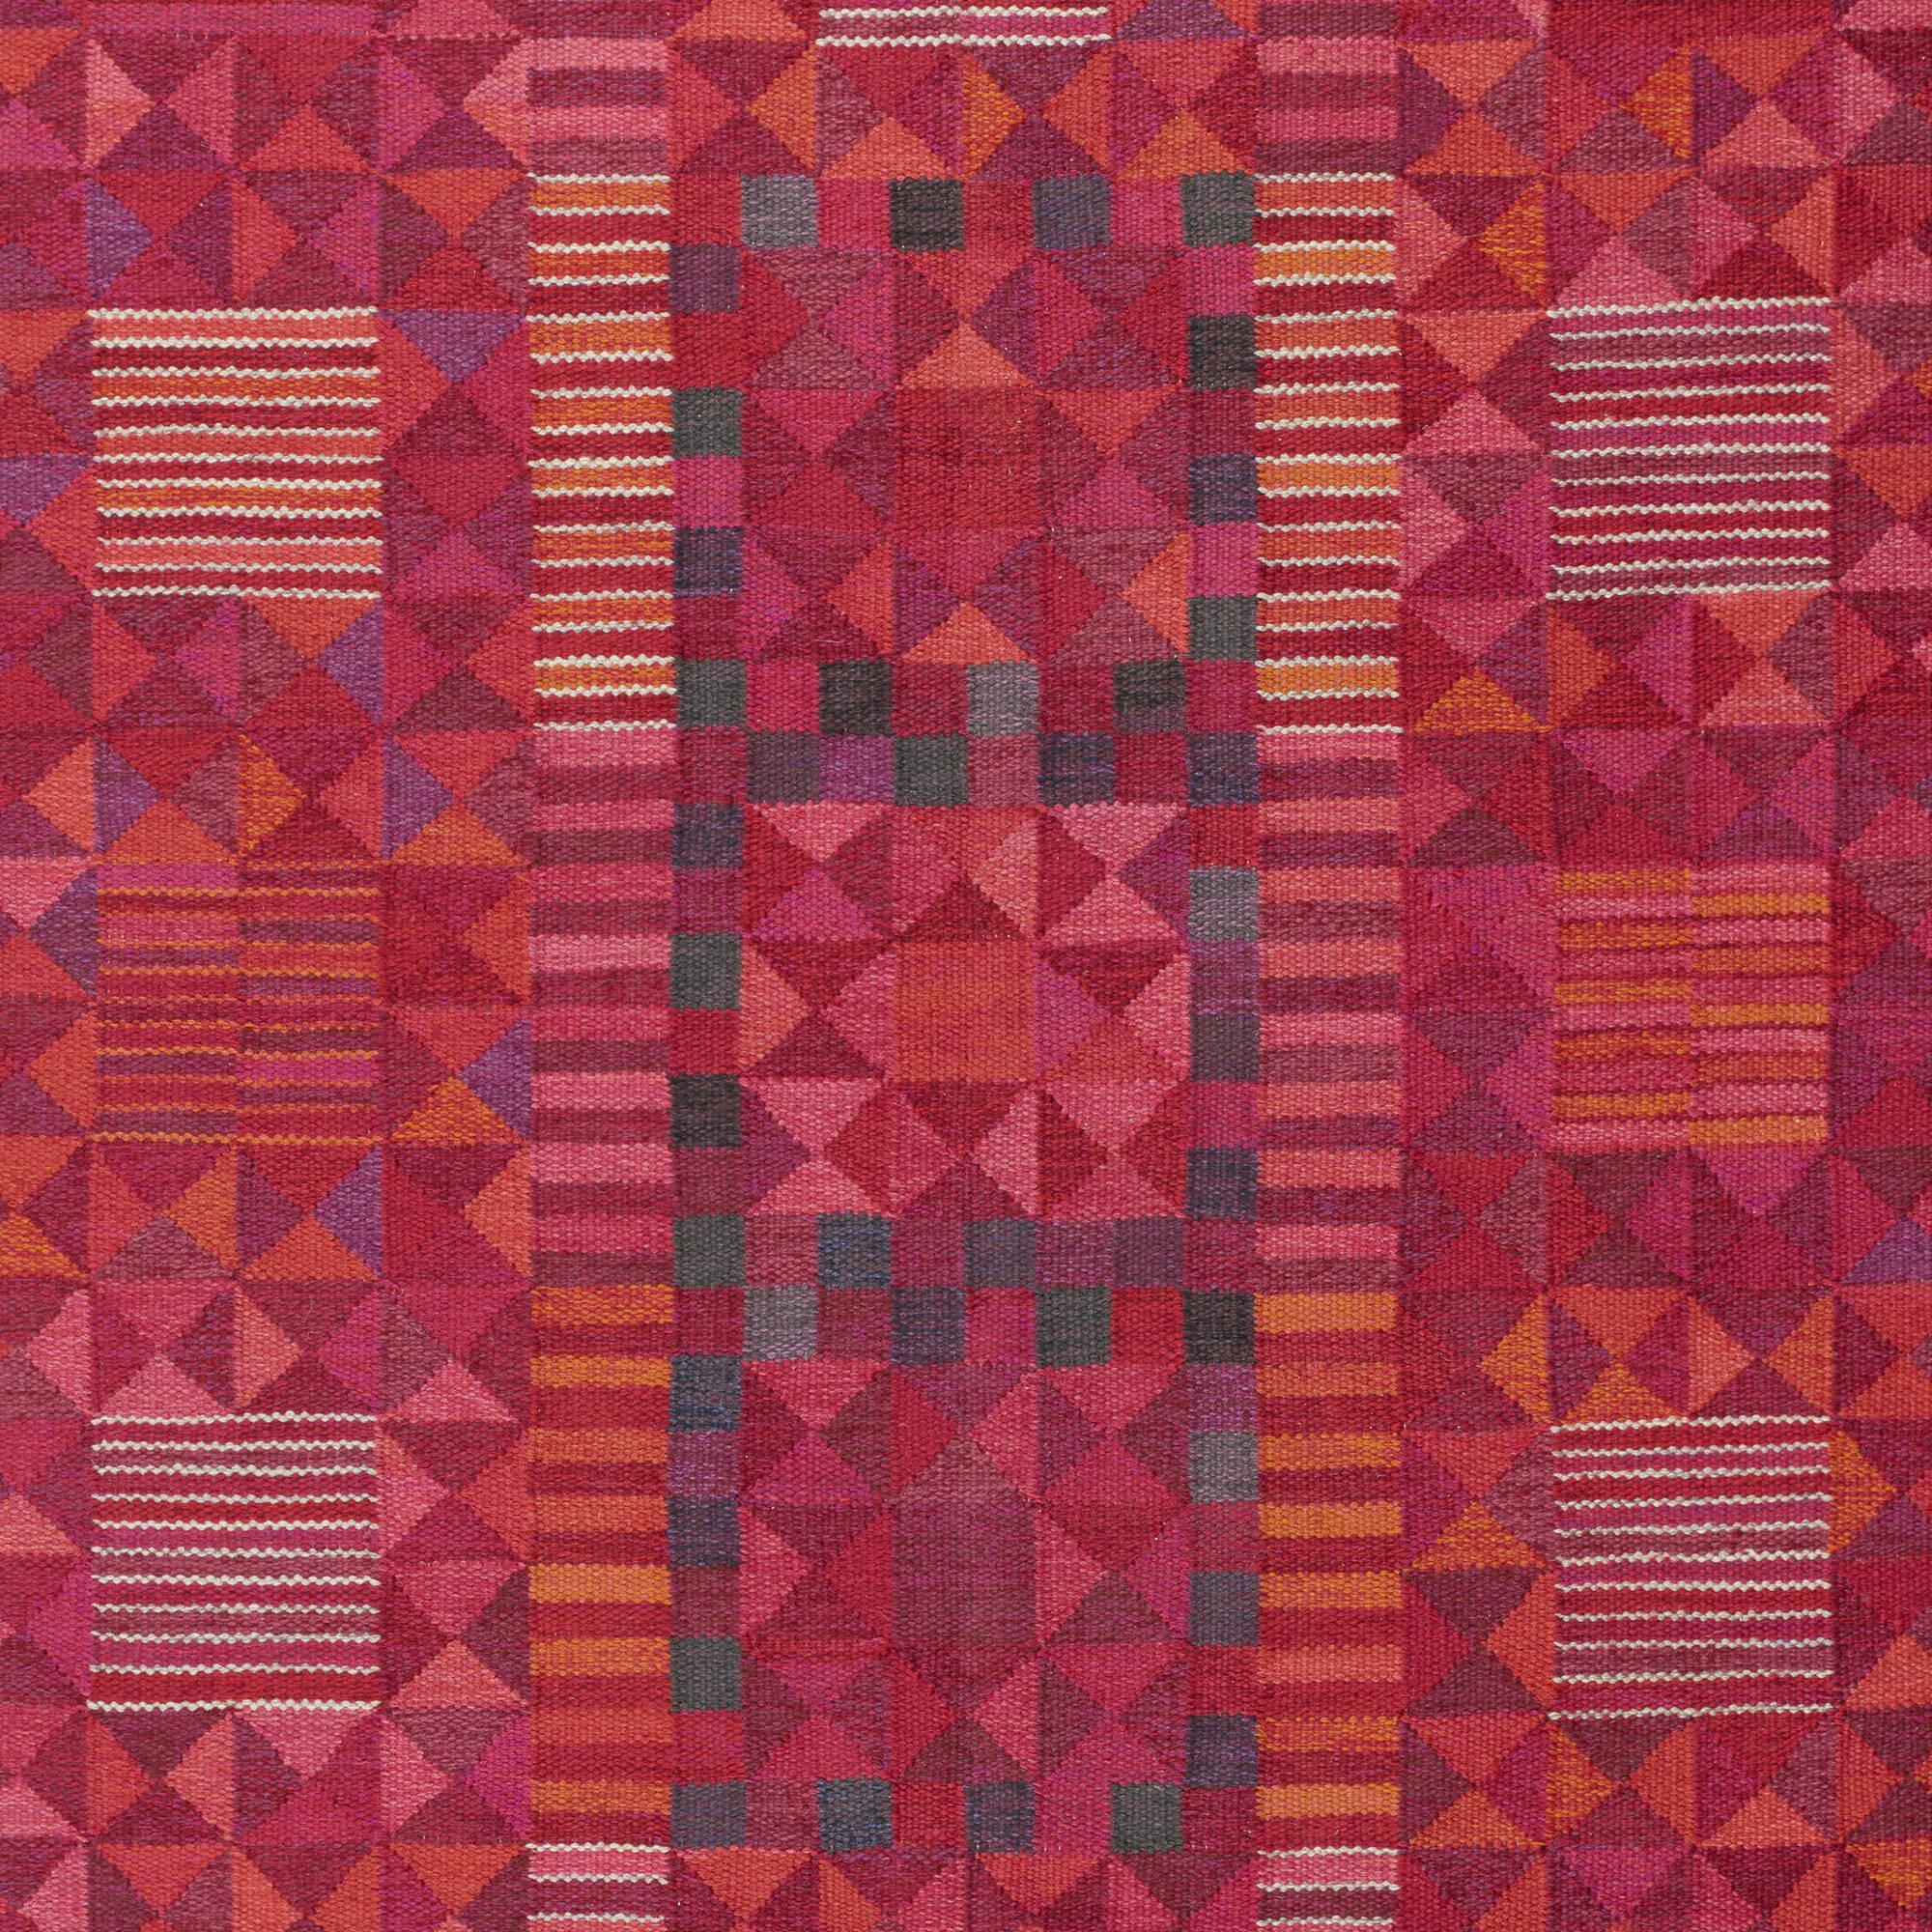 151: Marianne Richter / Rubirosa flatweave carpet (3 of 3)